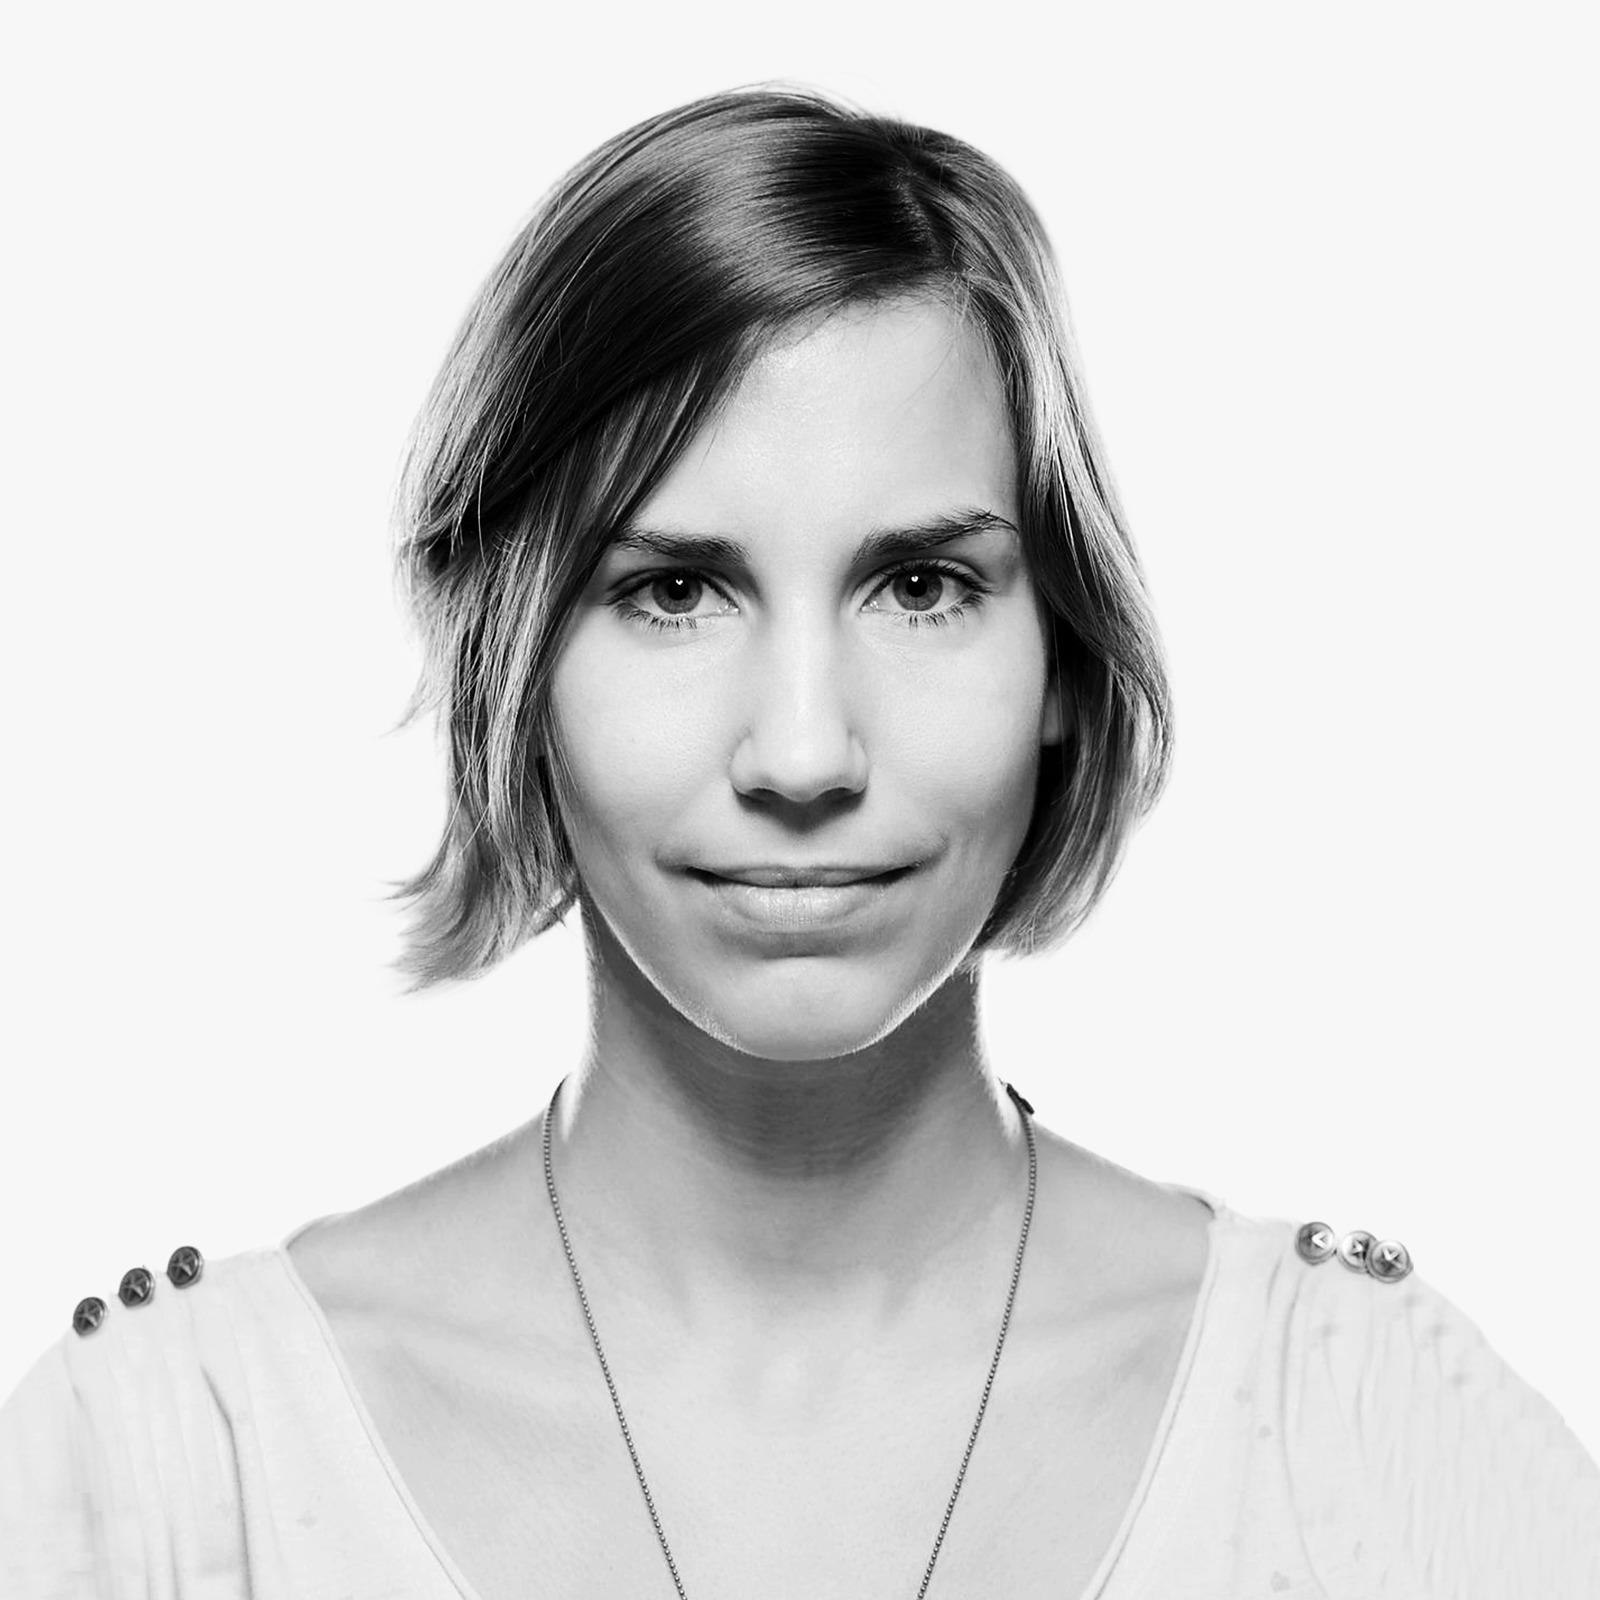 Portrait of Sonja Heinen